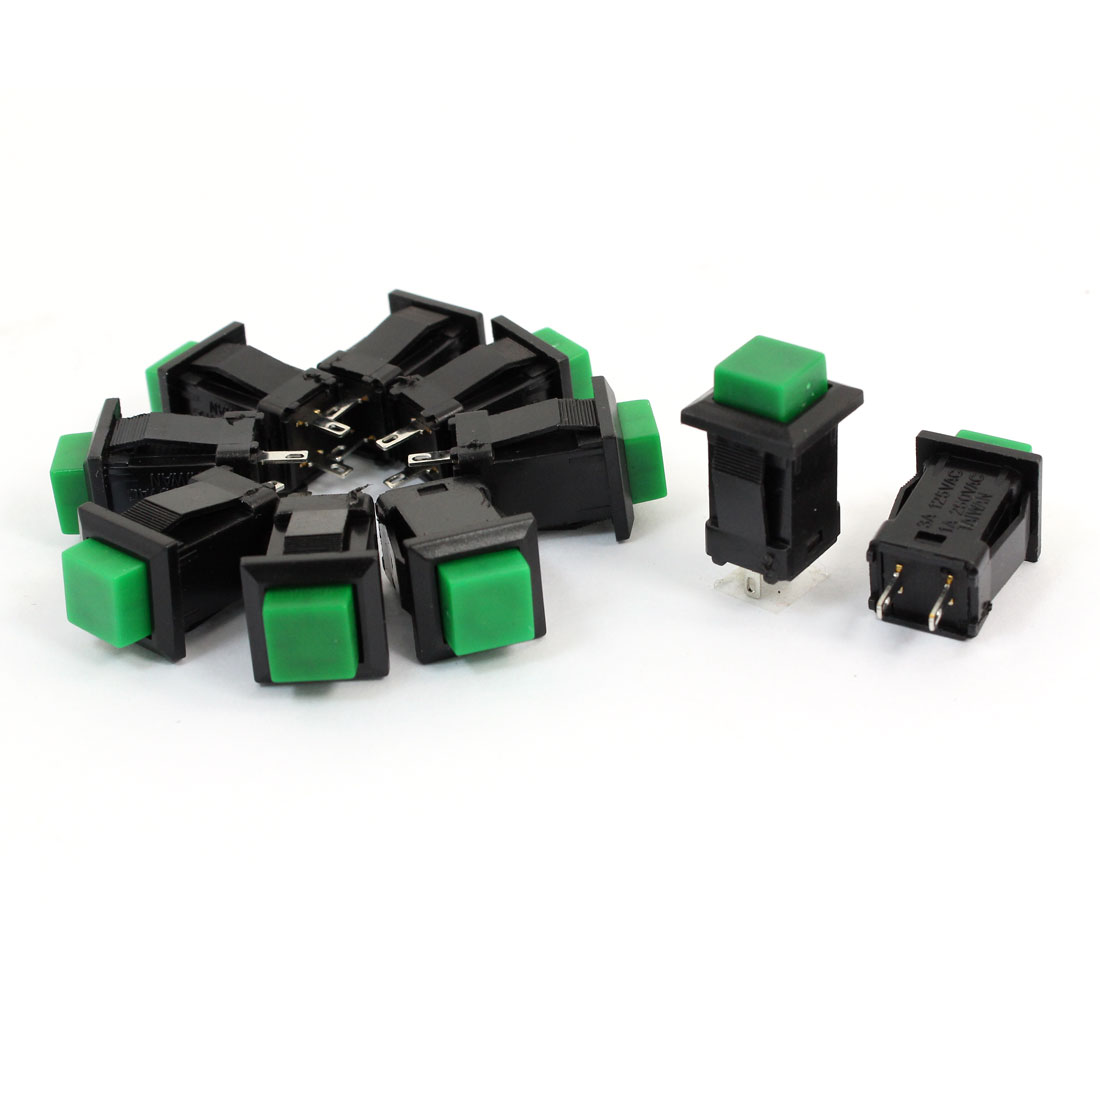 3A/AC125V 1A/AC250V SPST Square Head Push Button Switch for Machine Tool